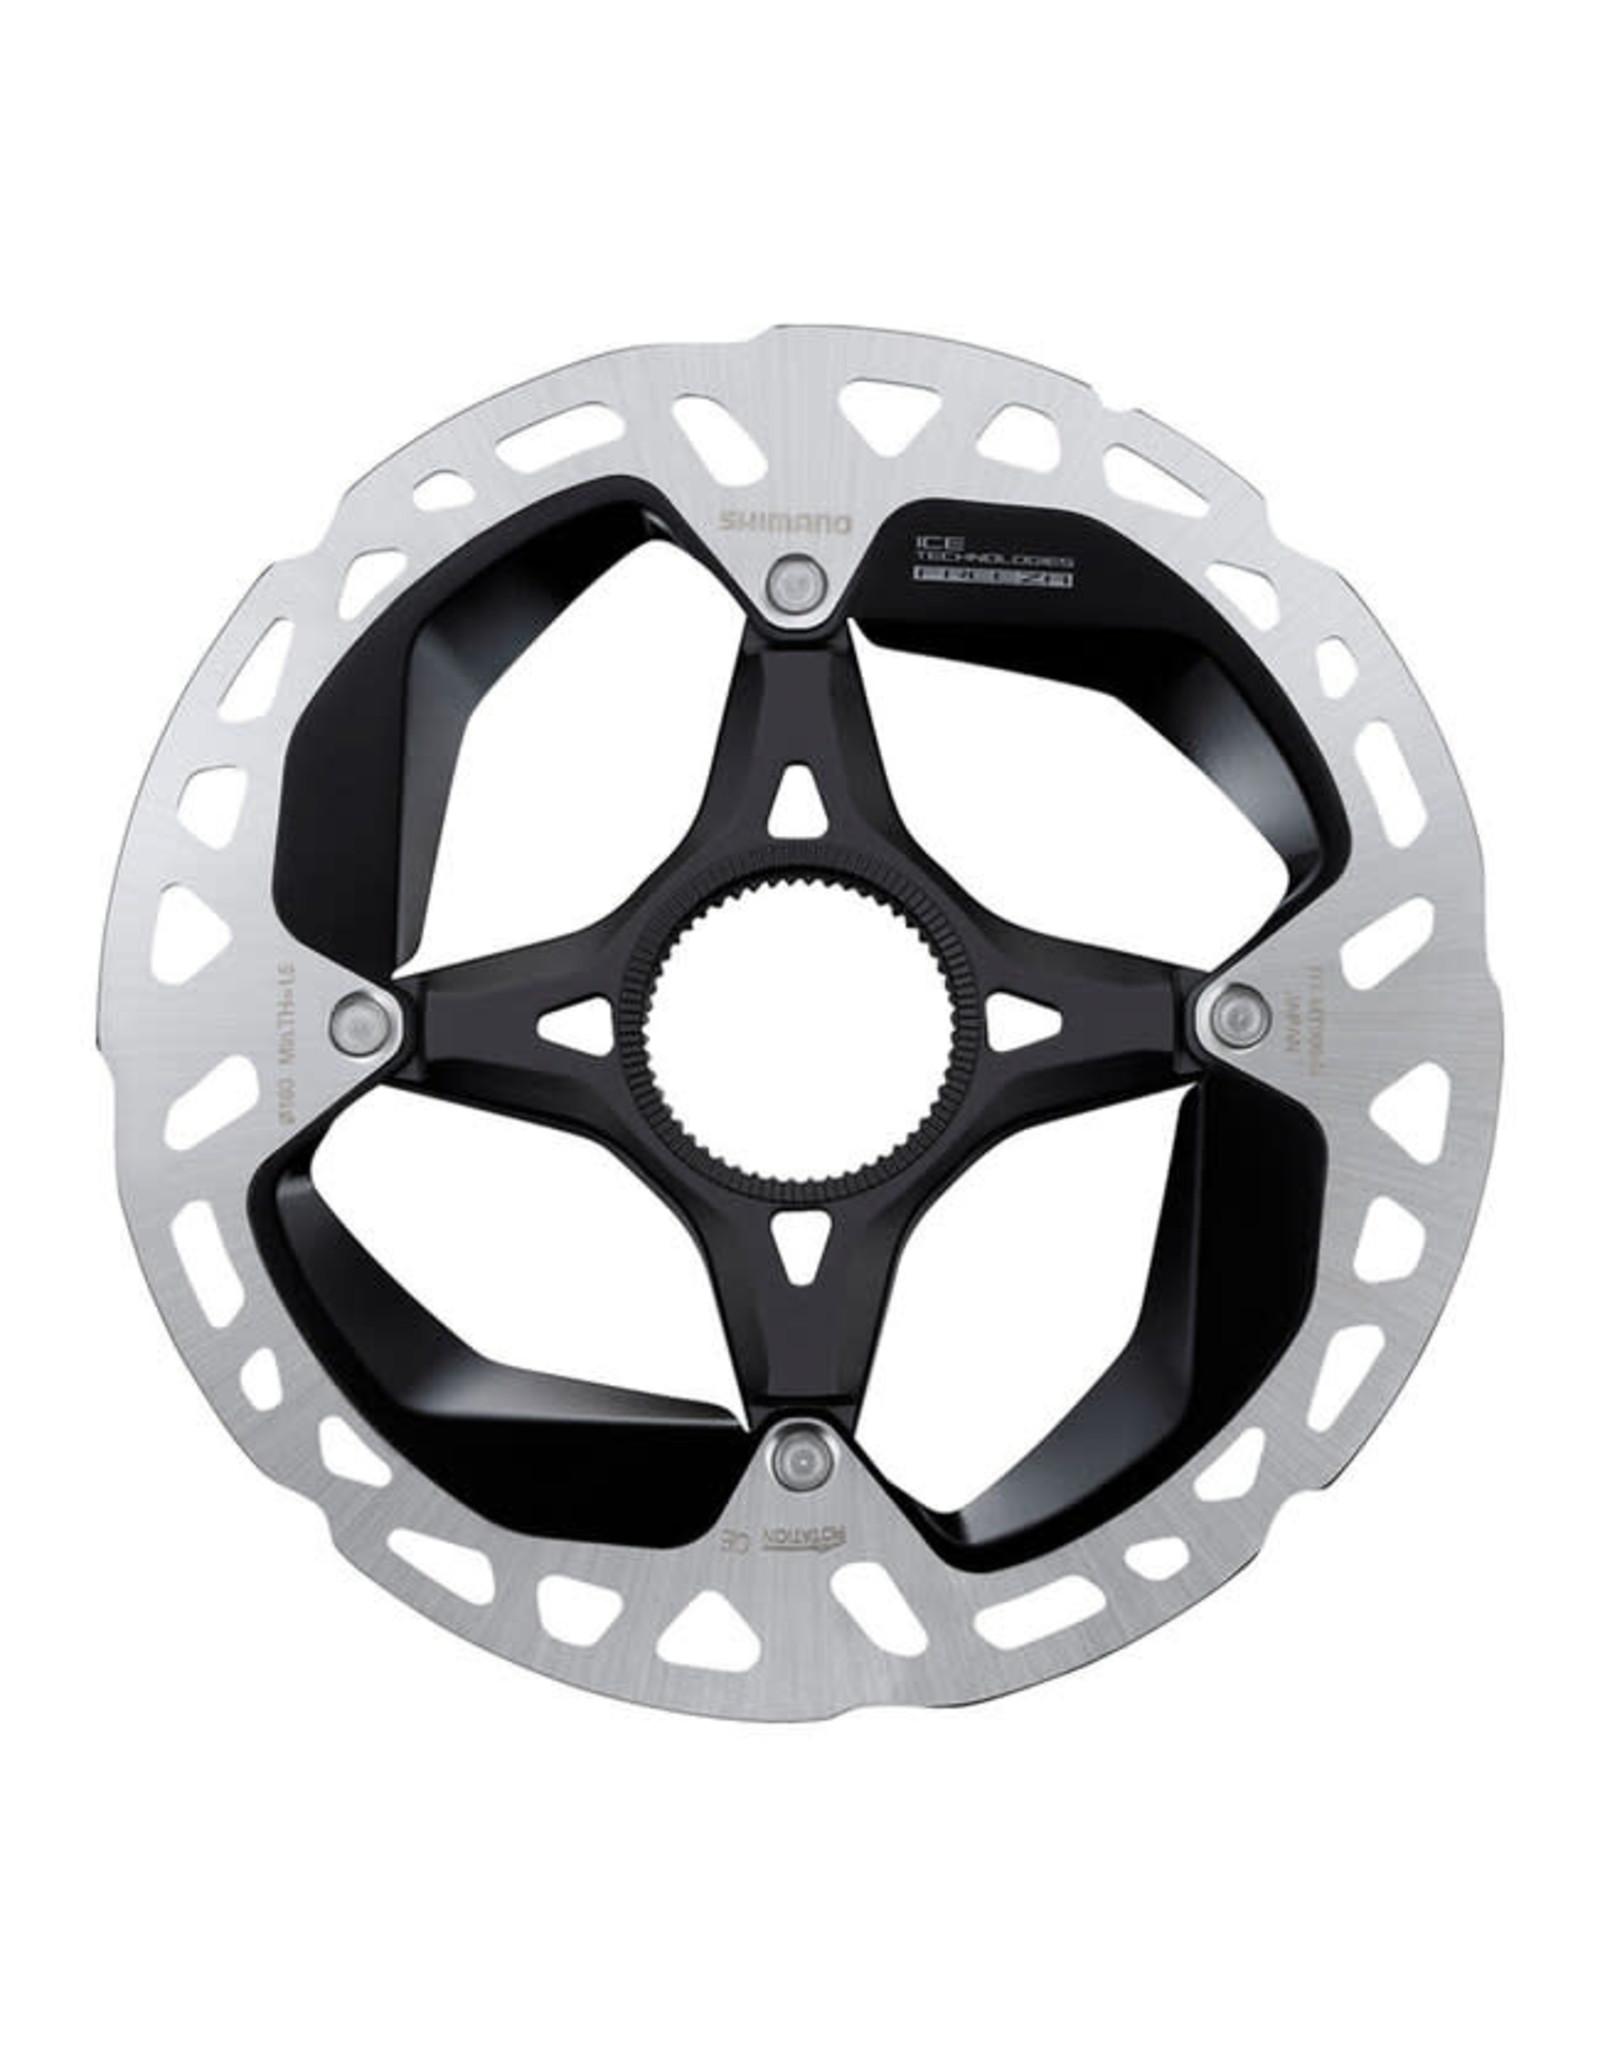 Shimano Rotor Shimano XTR MT900 center lock